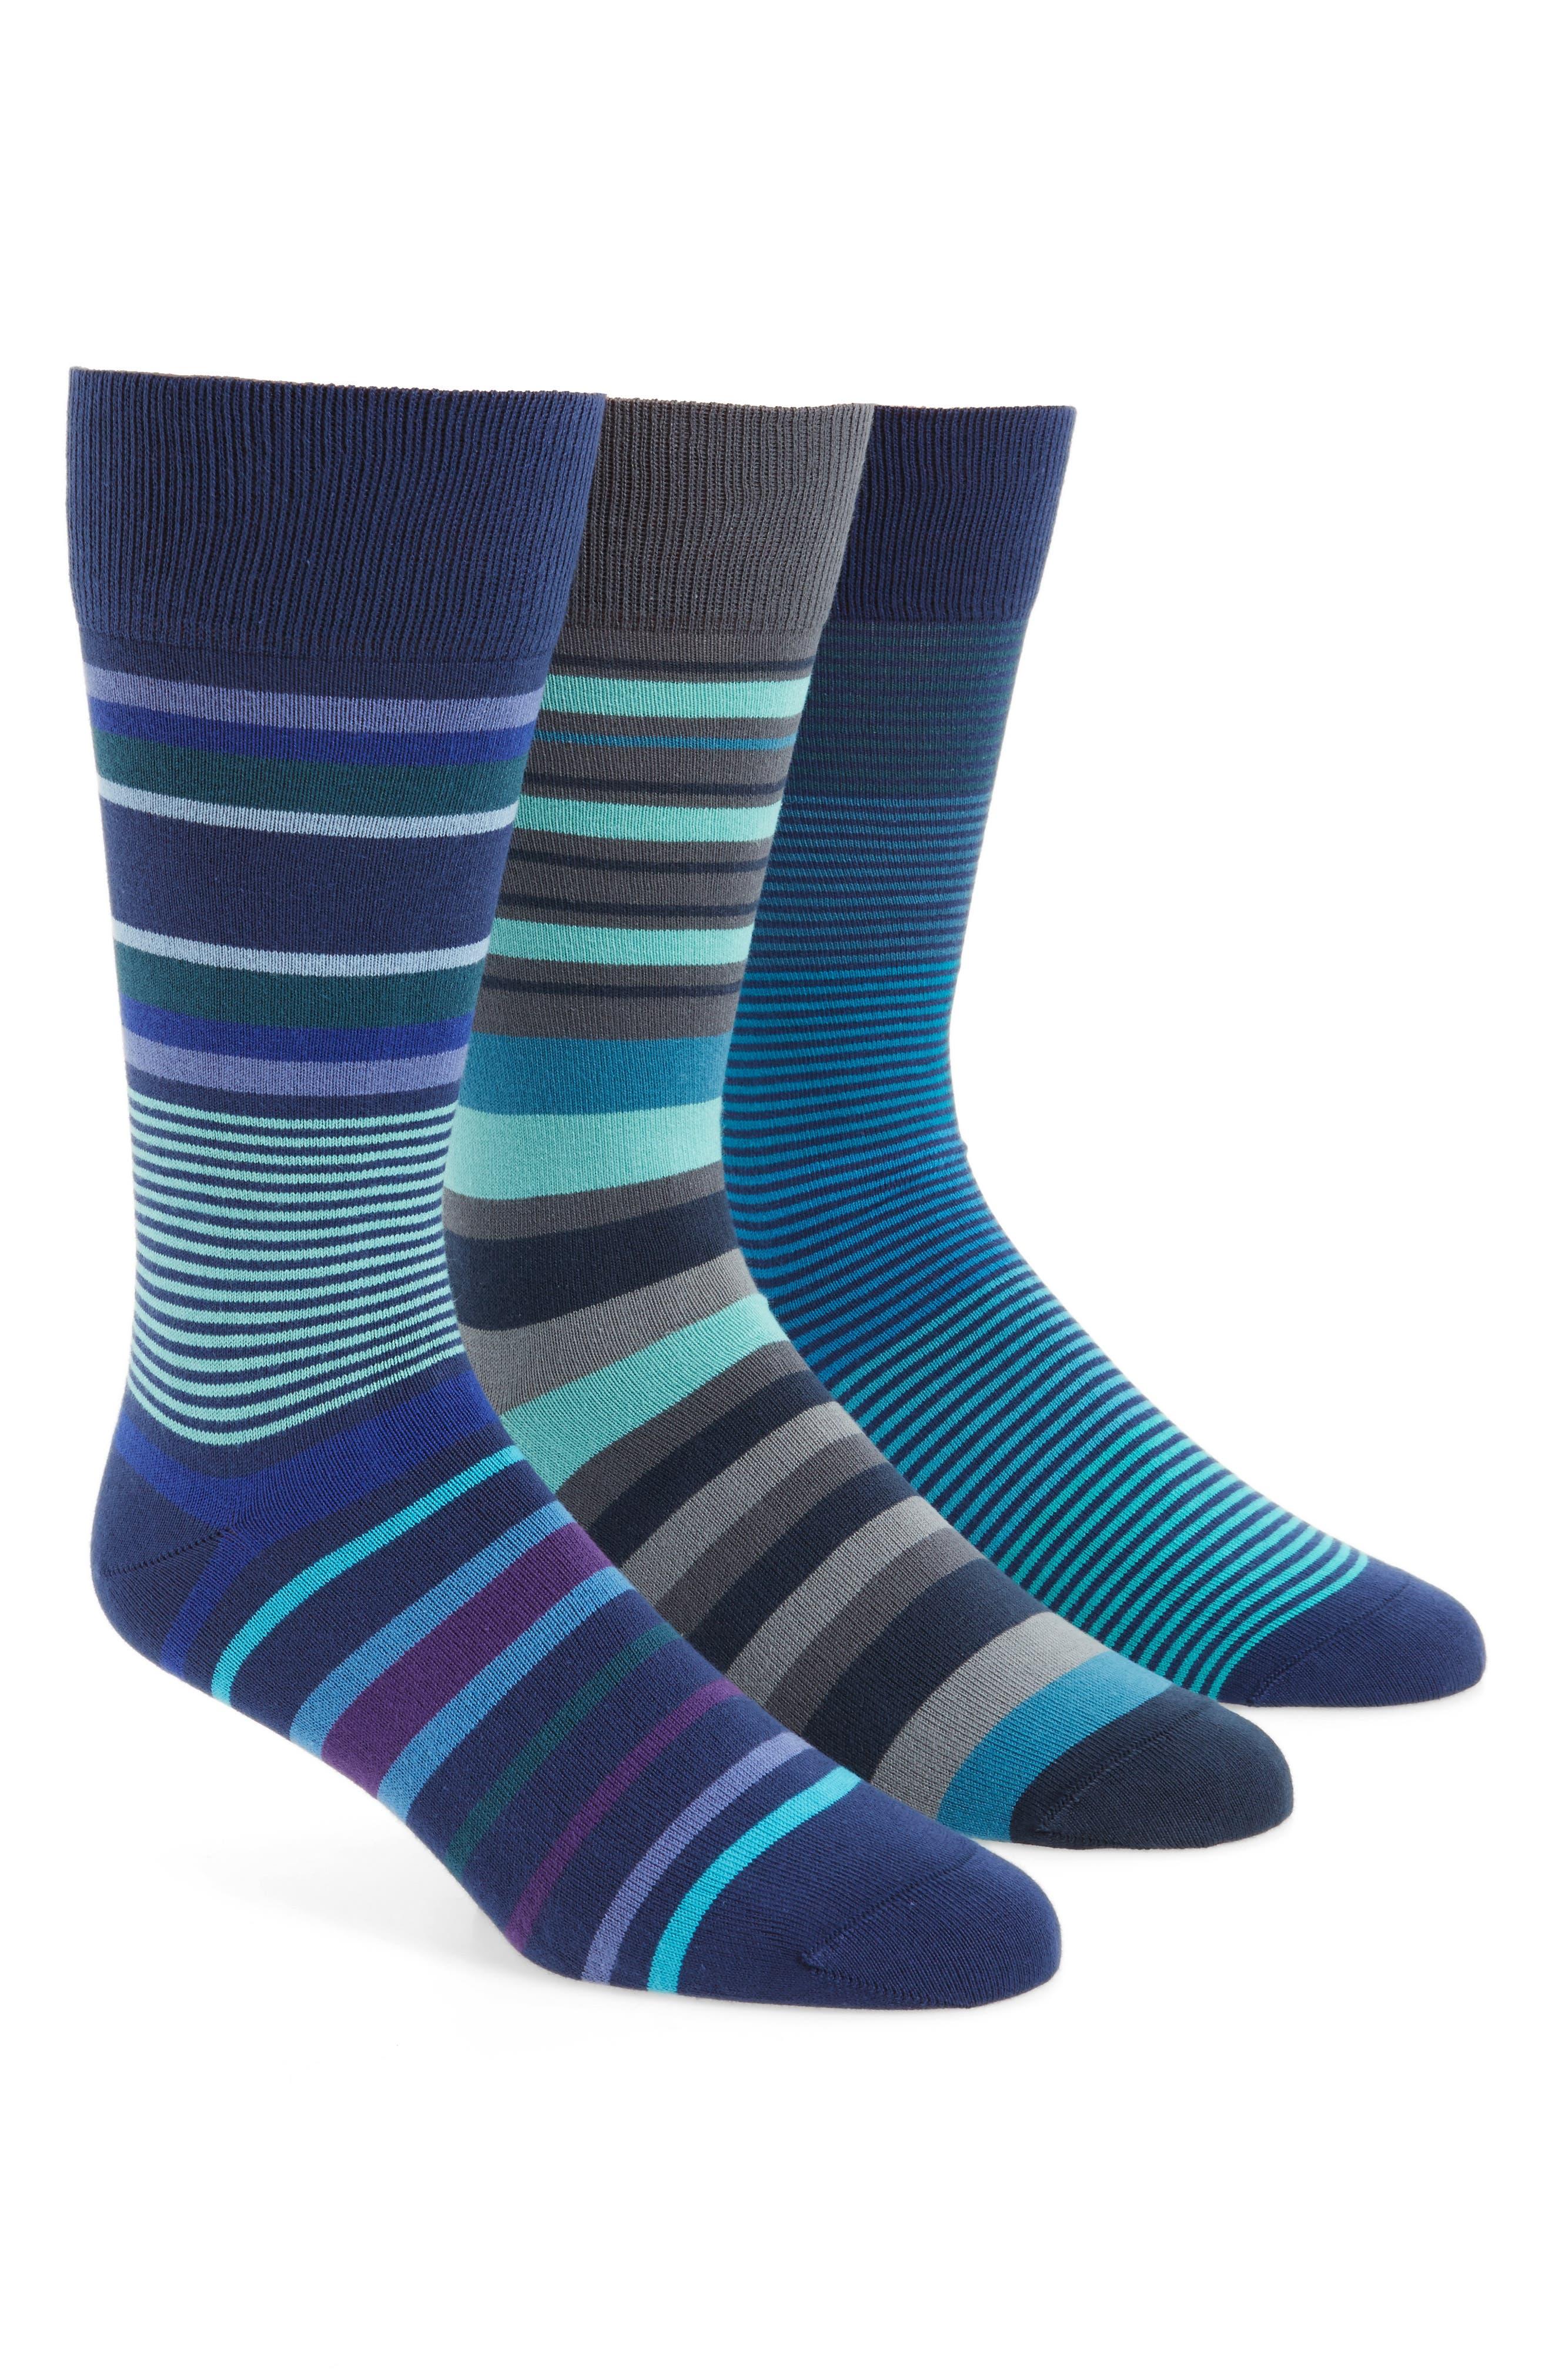 Main Image - Paul Smith 3-Pack Stripe Socks ($90 Value)